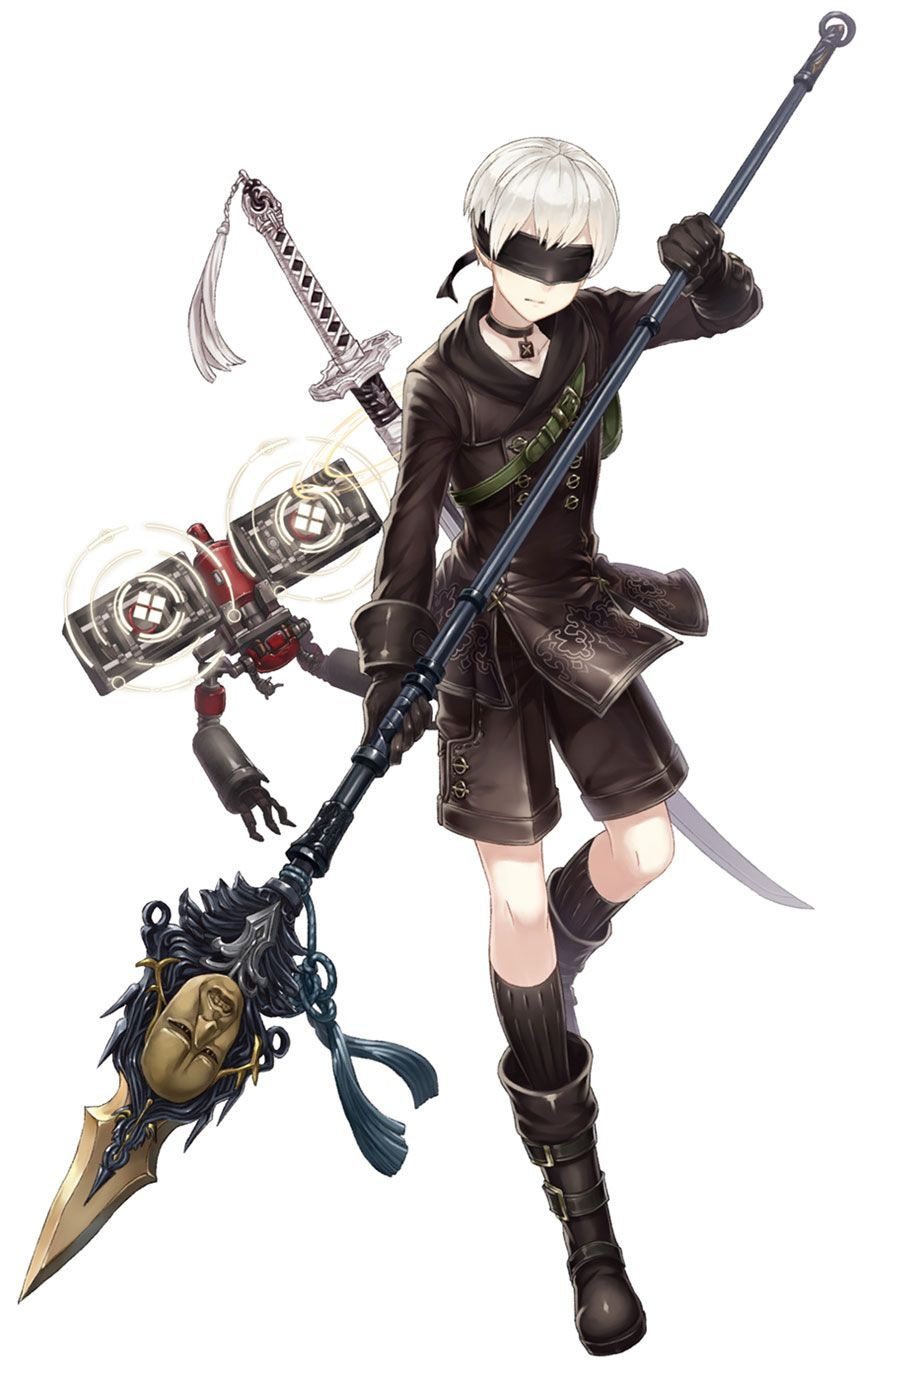 9S, Paladin Job Character Art from SINoALICE #art #artwork #gaming #videogames #gamer #gameart # ...